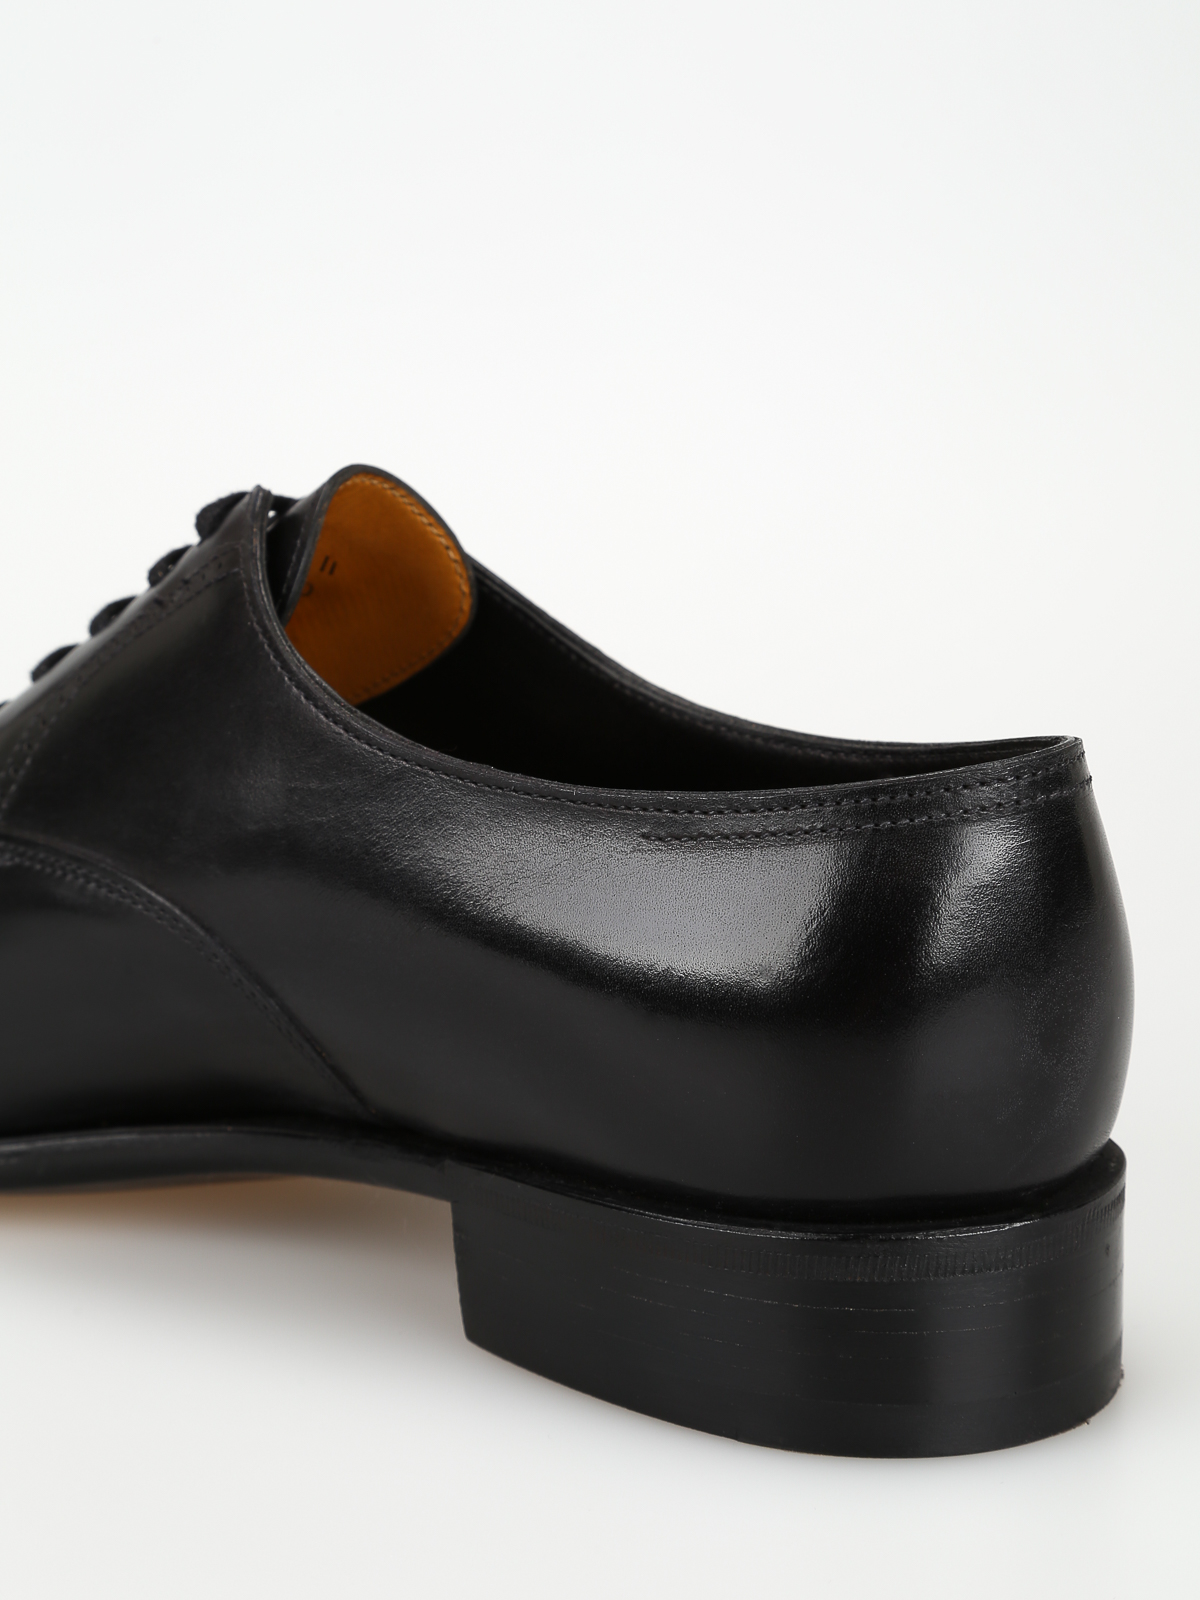 Classic shoes John LobbPhilip II black calf leather Oxford